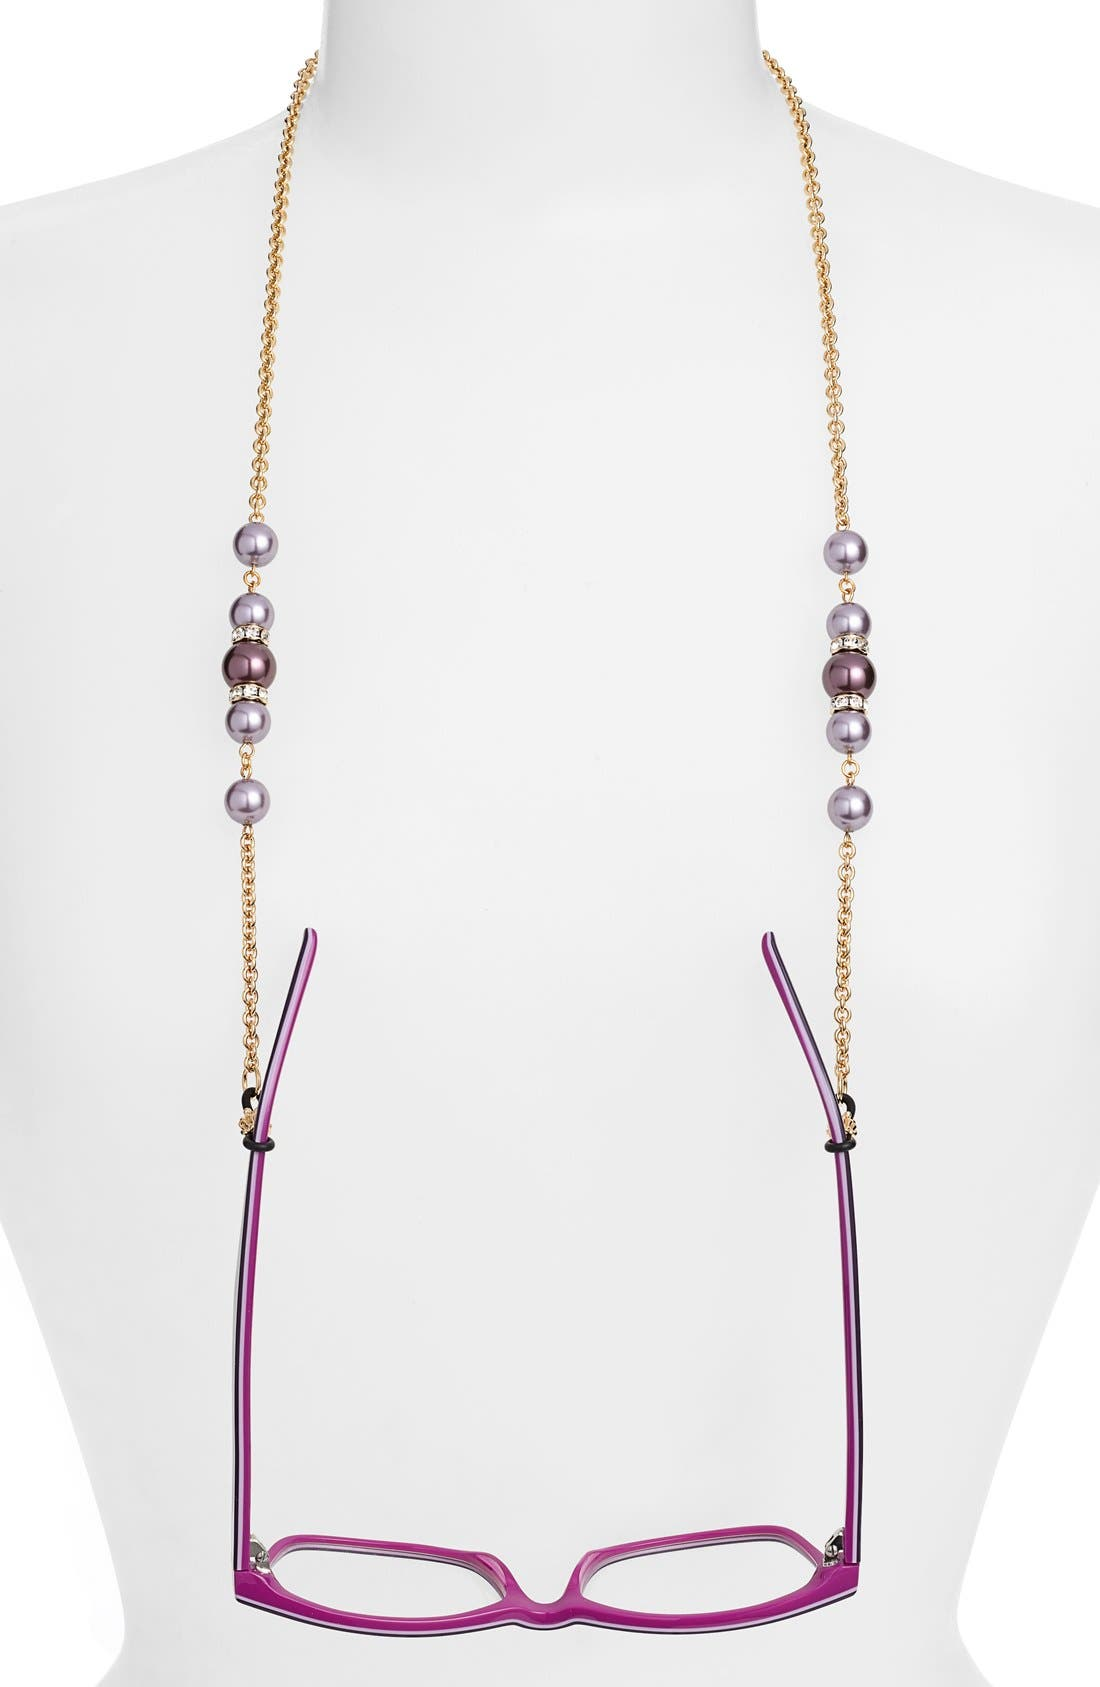 L. ERICKSON 'Cadabra' Swarovski Crystal Eyeglass Chain